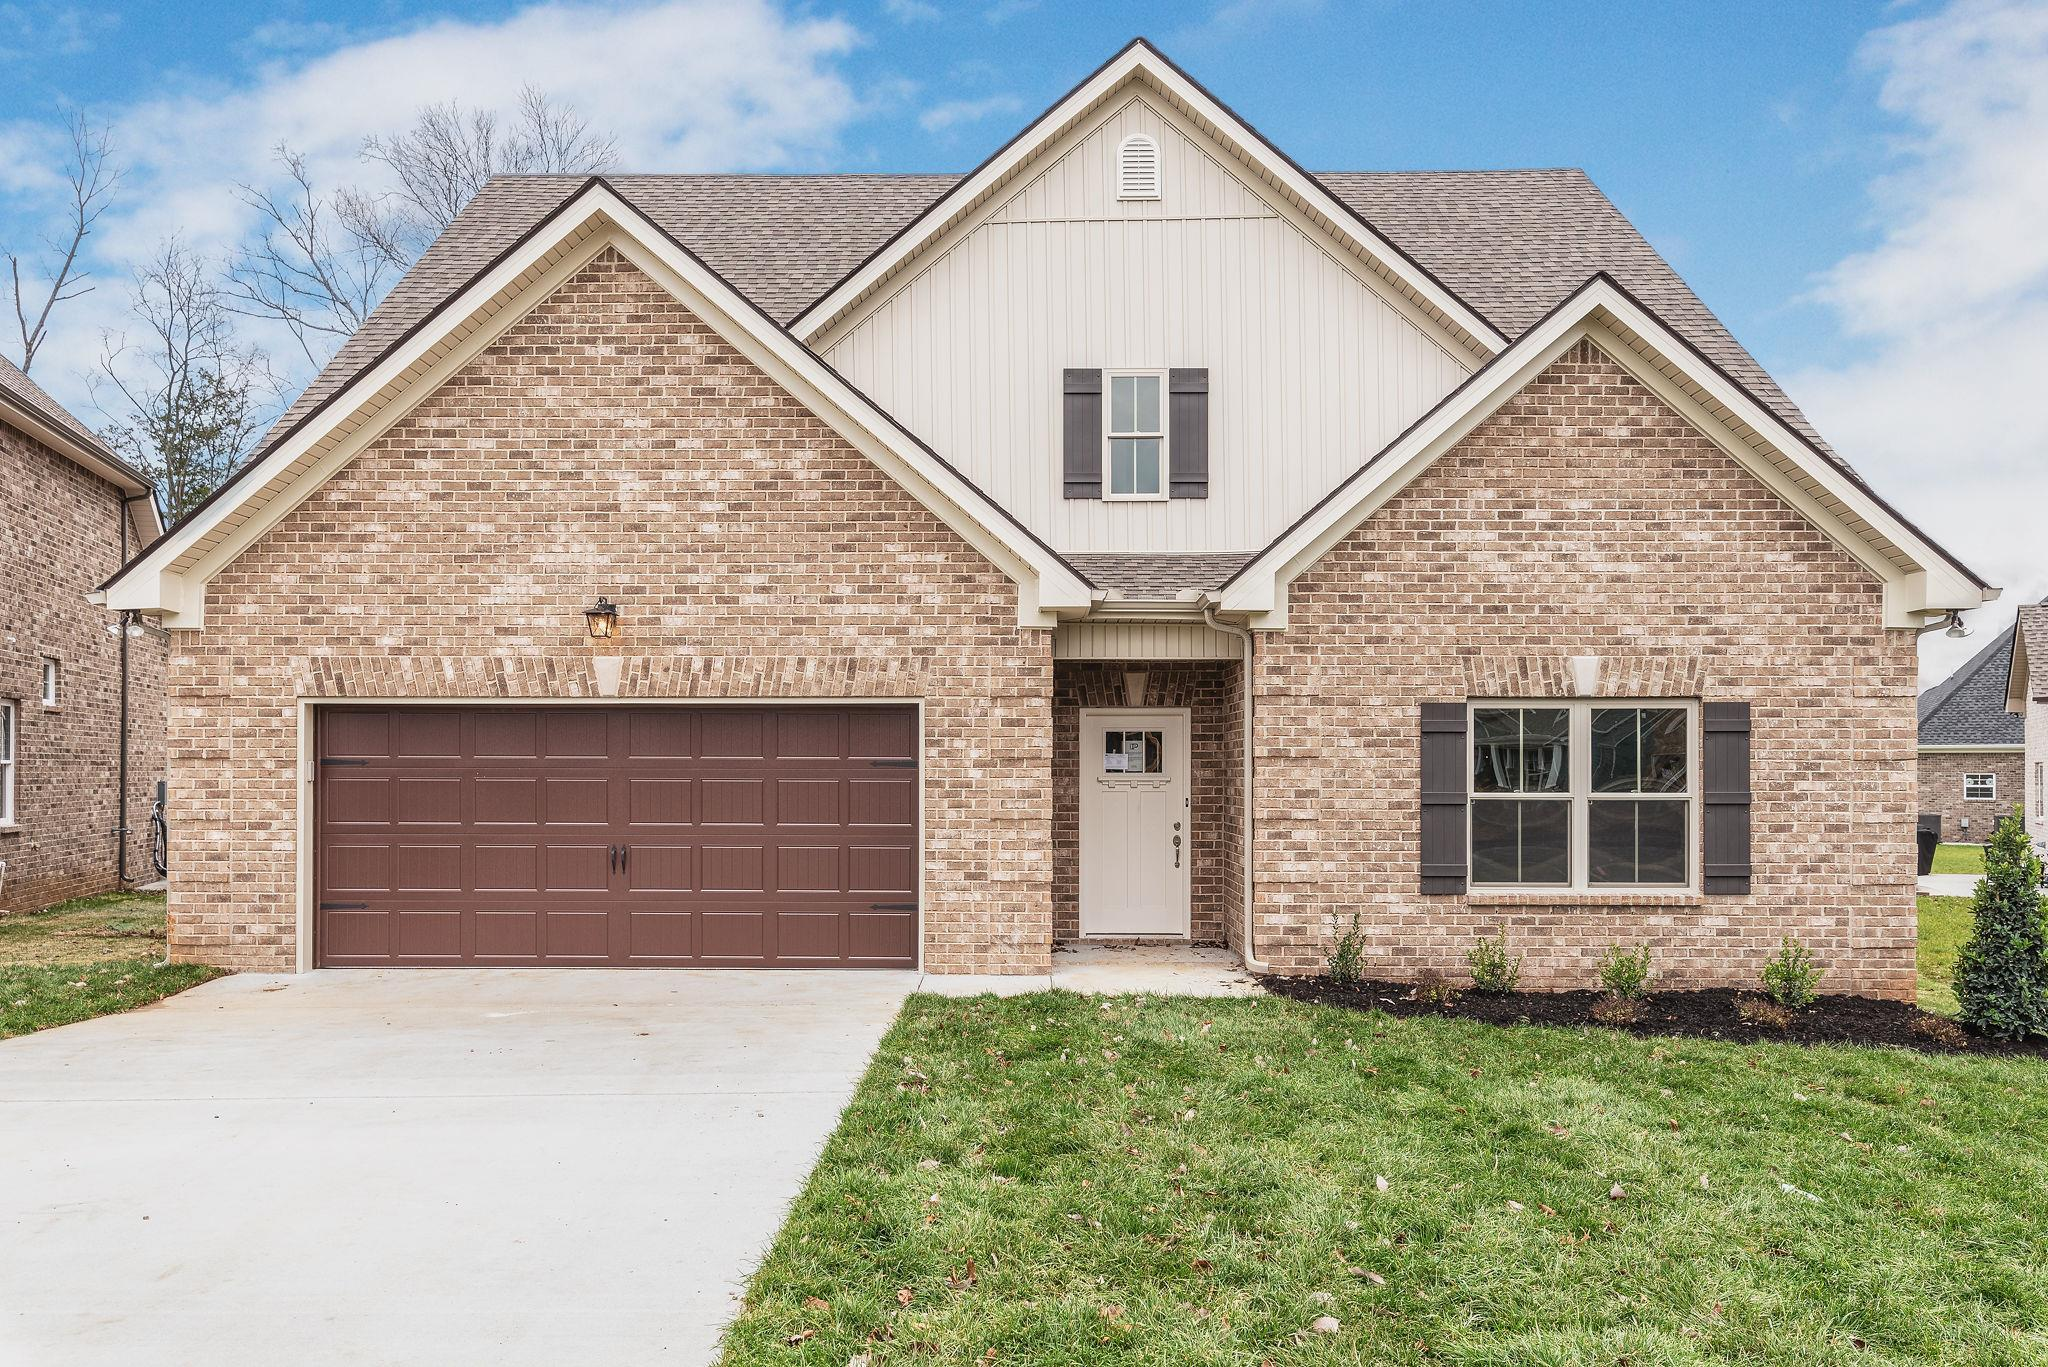 1208 Hensfield Dr, Murfreesboro, Tennessee